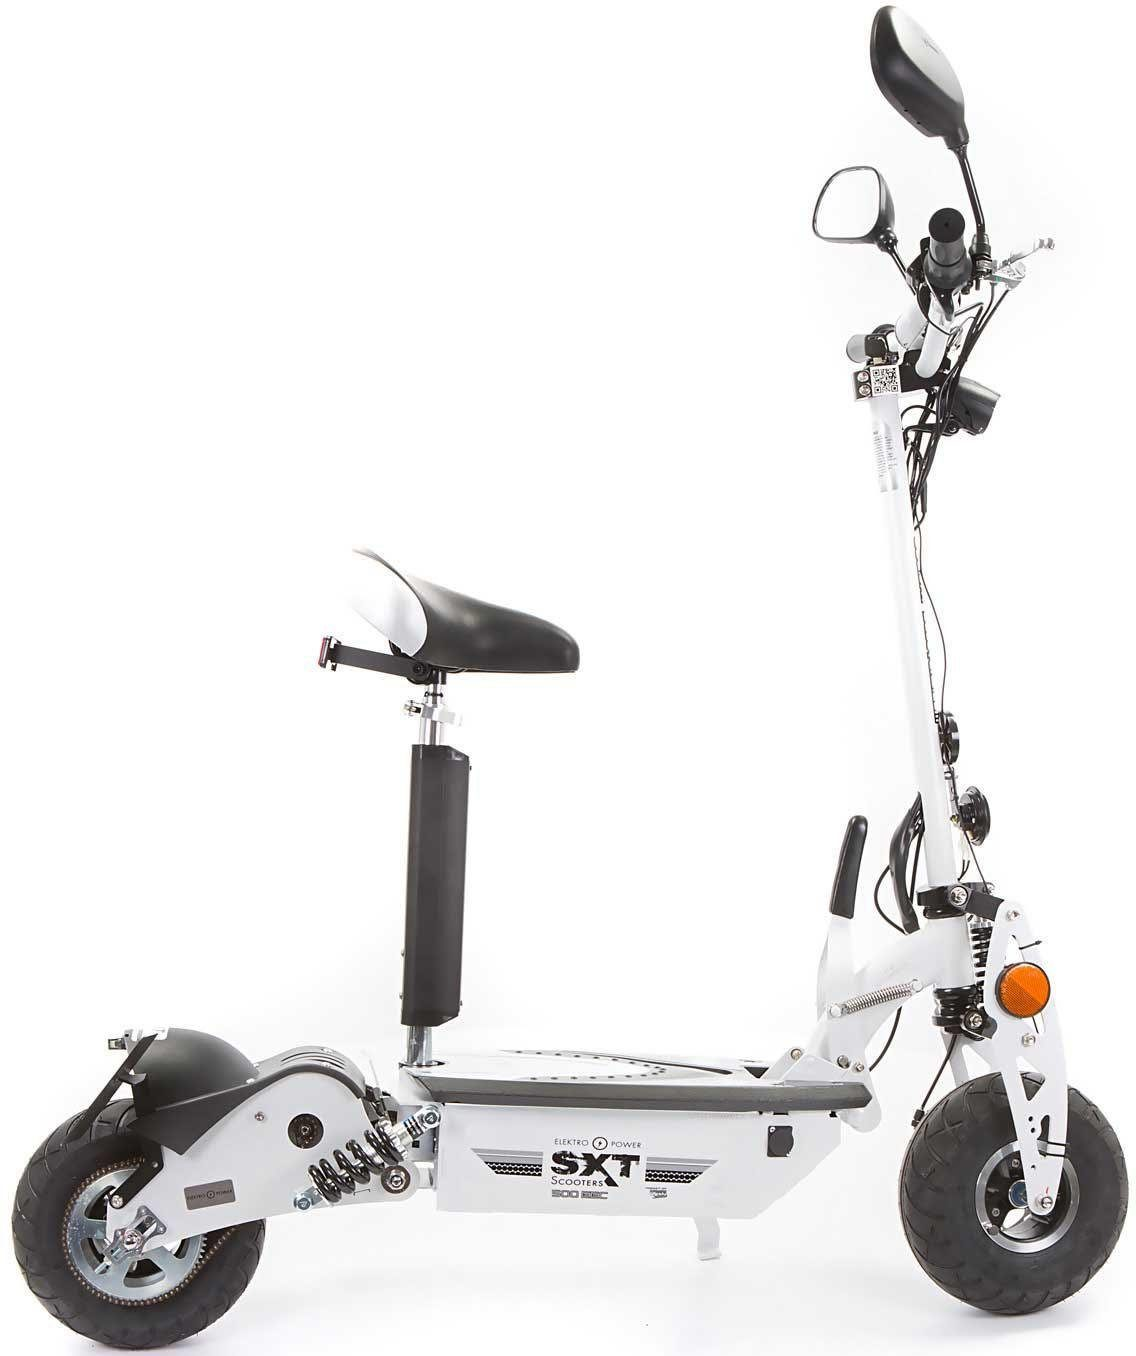 SXT Scooters E-Scooter »SXT500 EEC LiIon Lithiumakku«, 500 W, 20 km/h